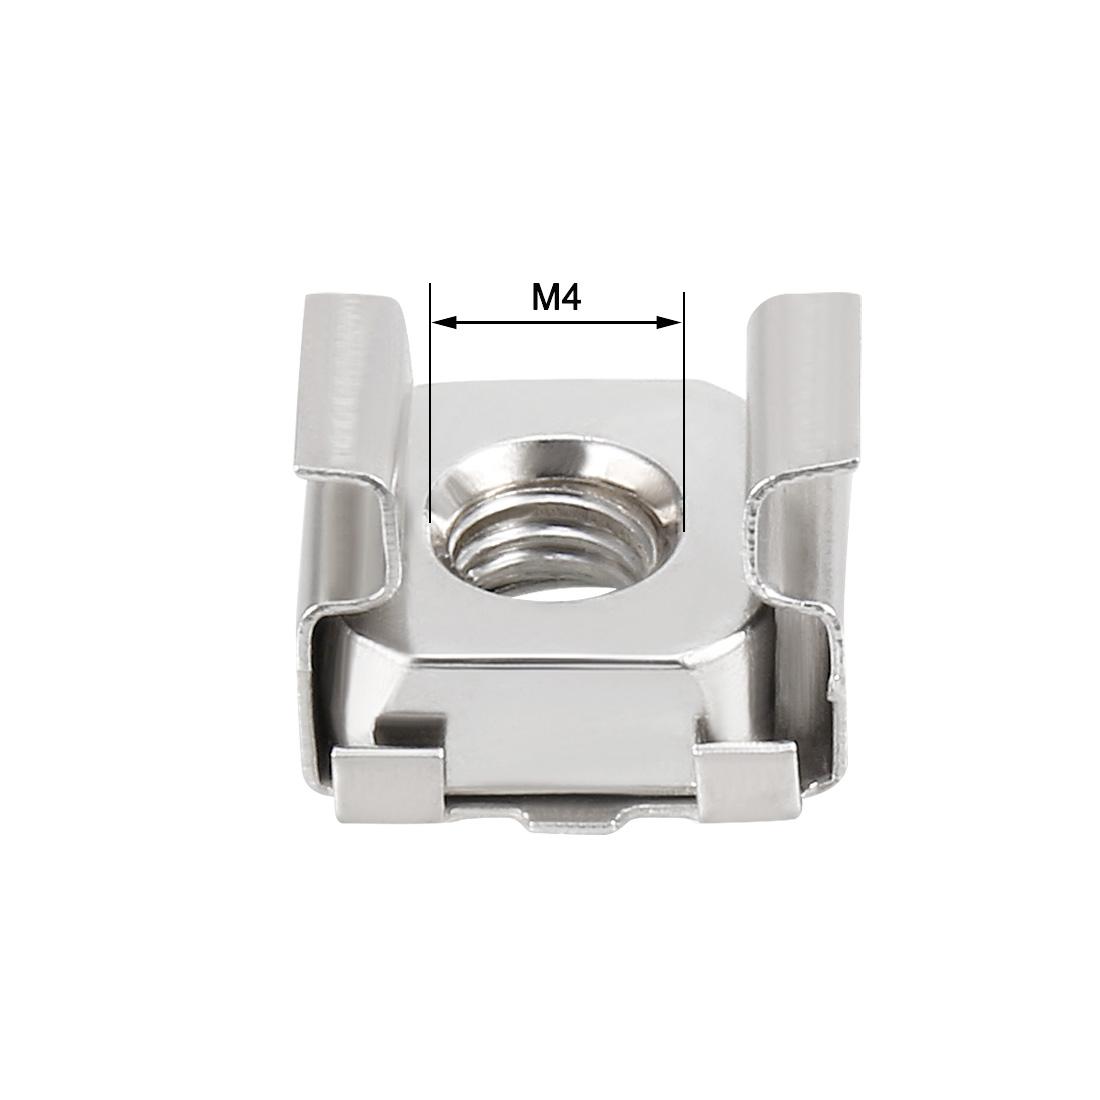 Unique Bargains 35pcs Carbon Steel Nickel Plated M4 Cage Nut for Server Shelf Cabinet - image 3 de 4